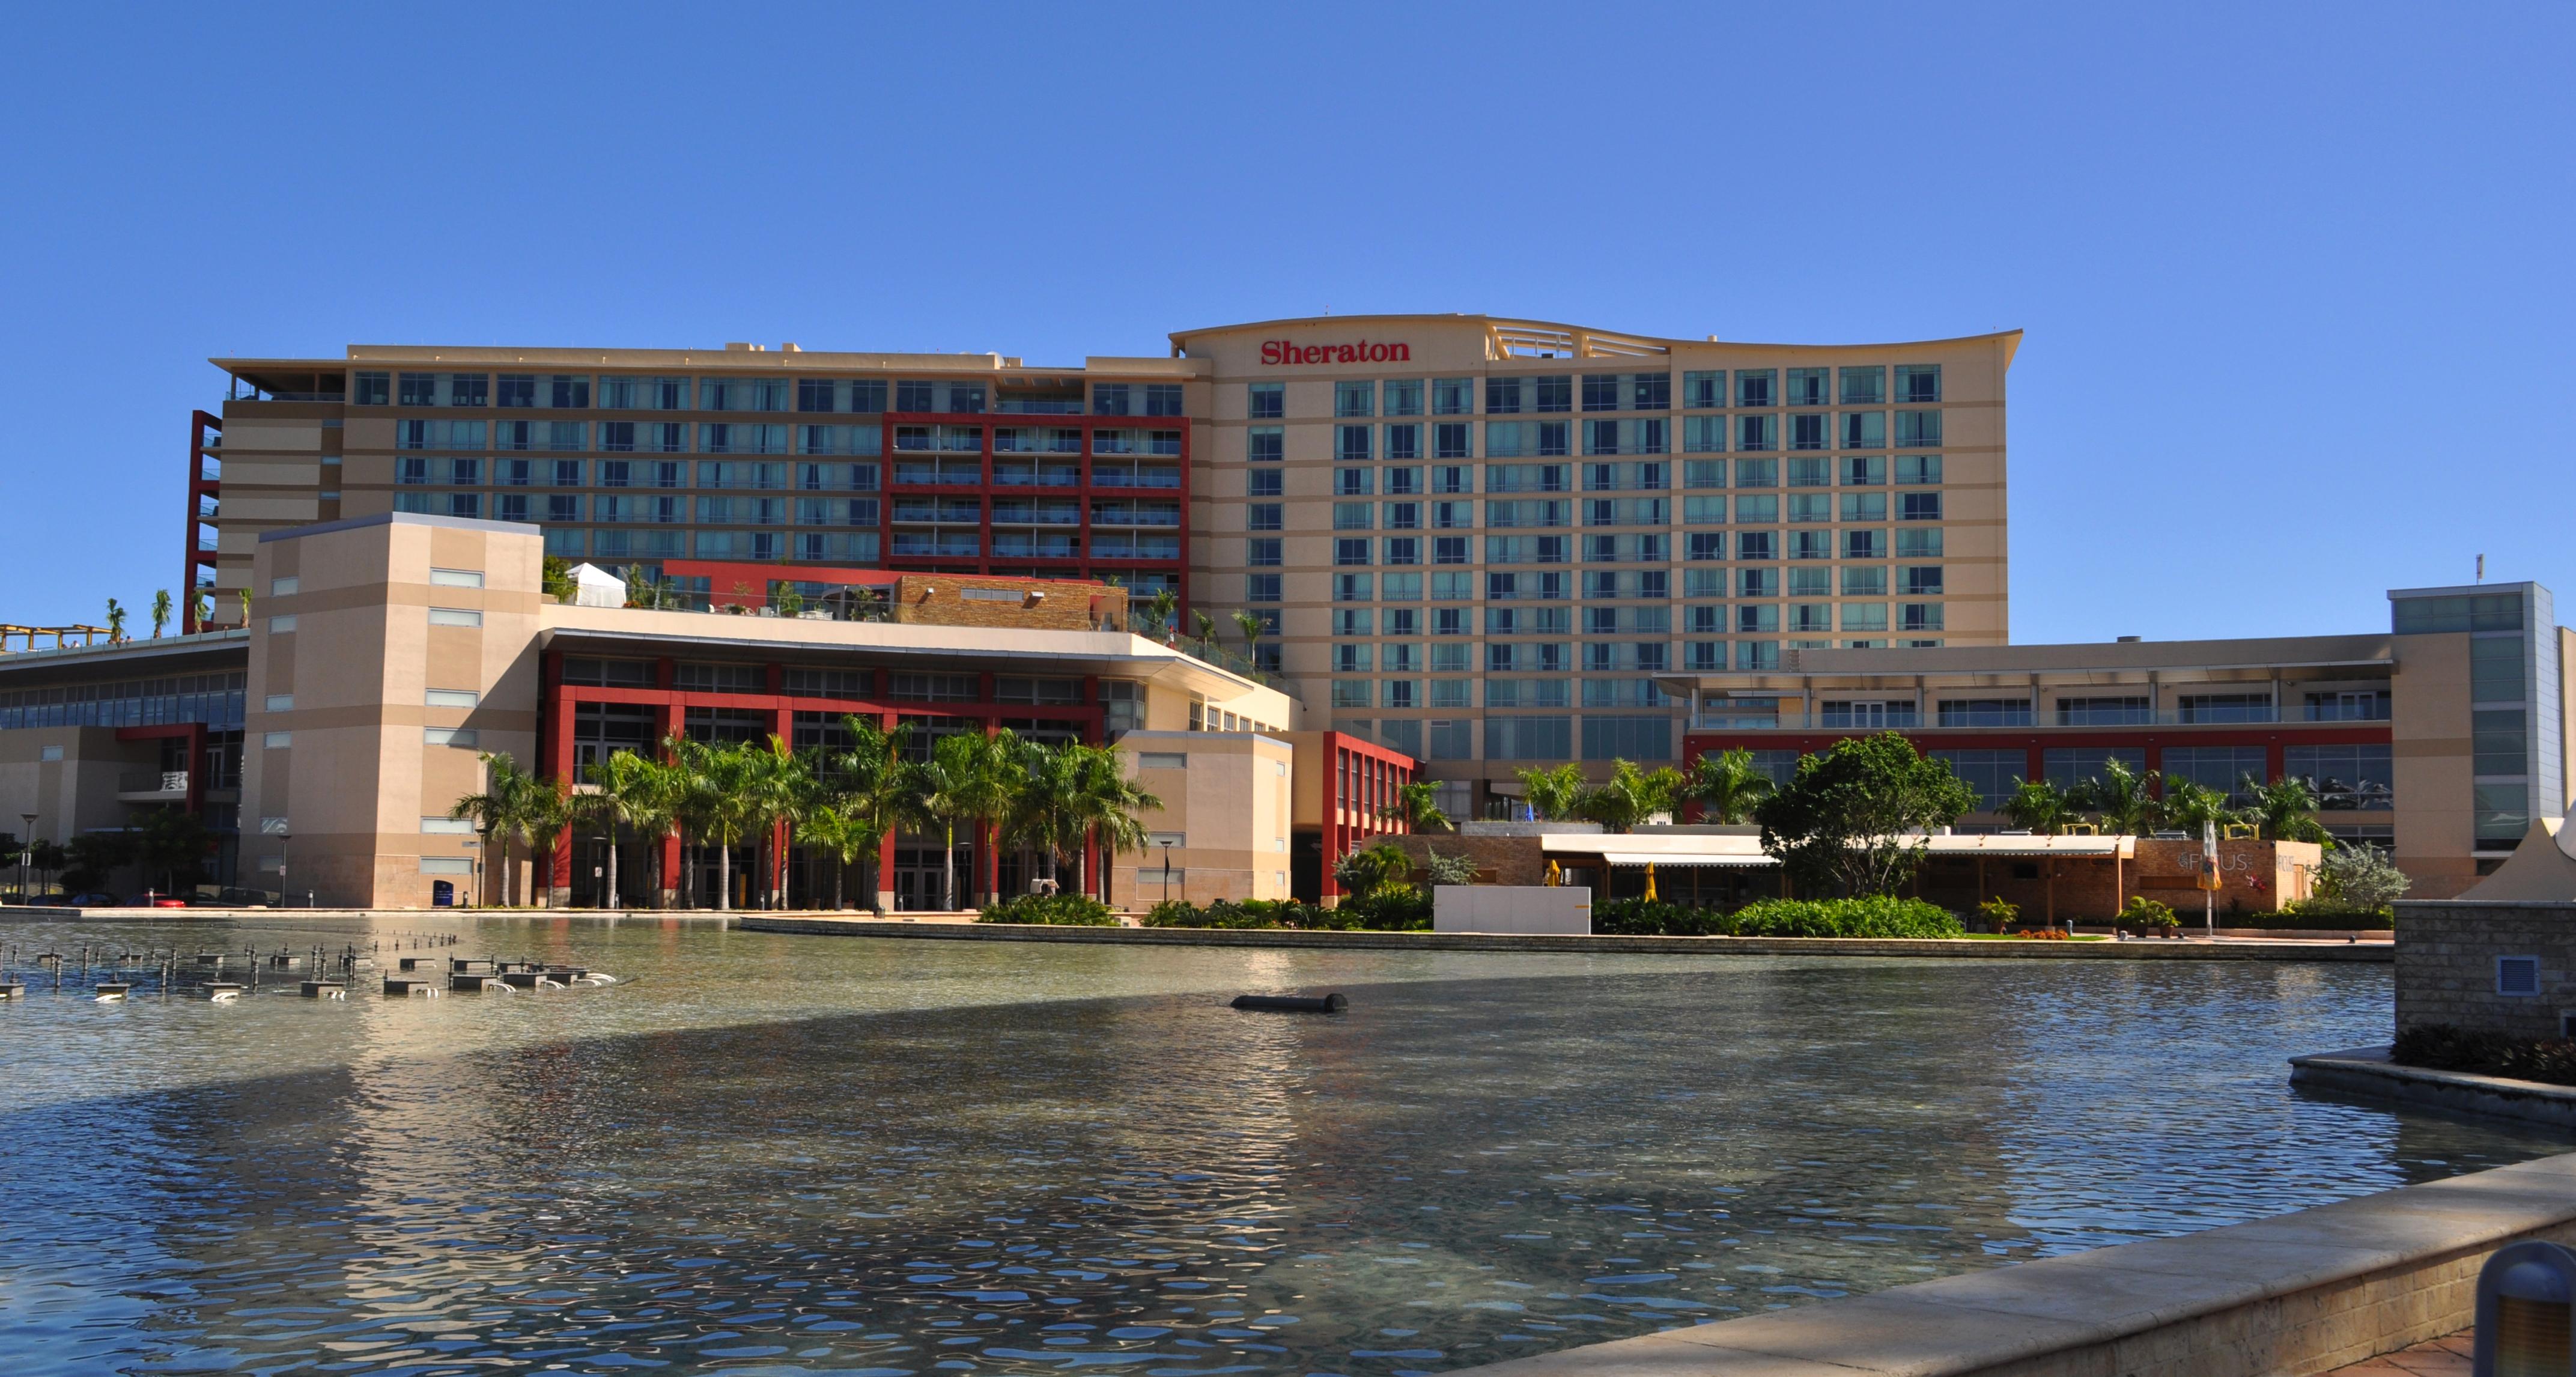 sheraton hotel and casino puerto rico